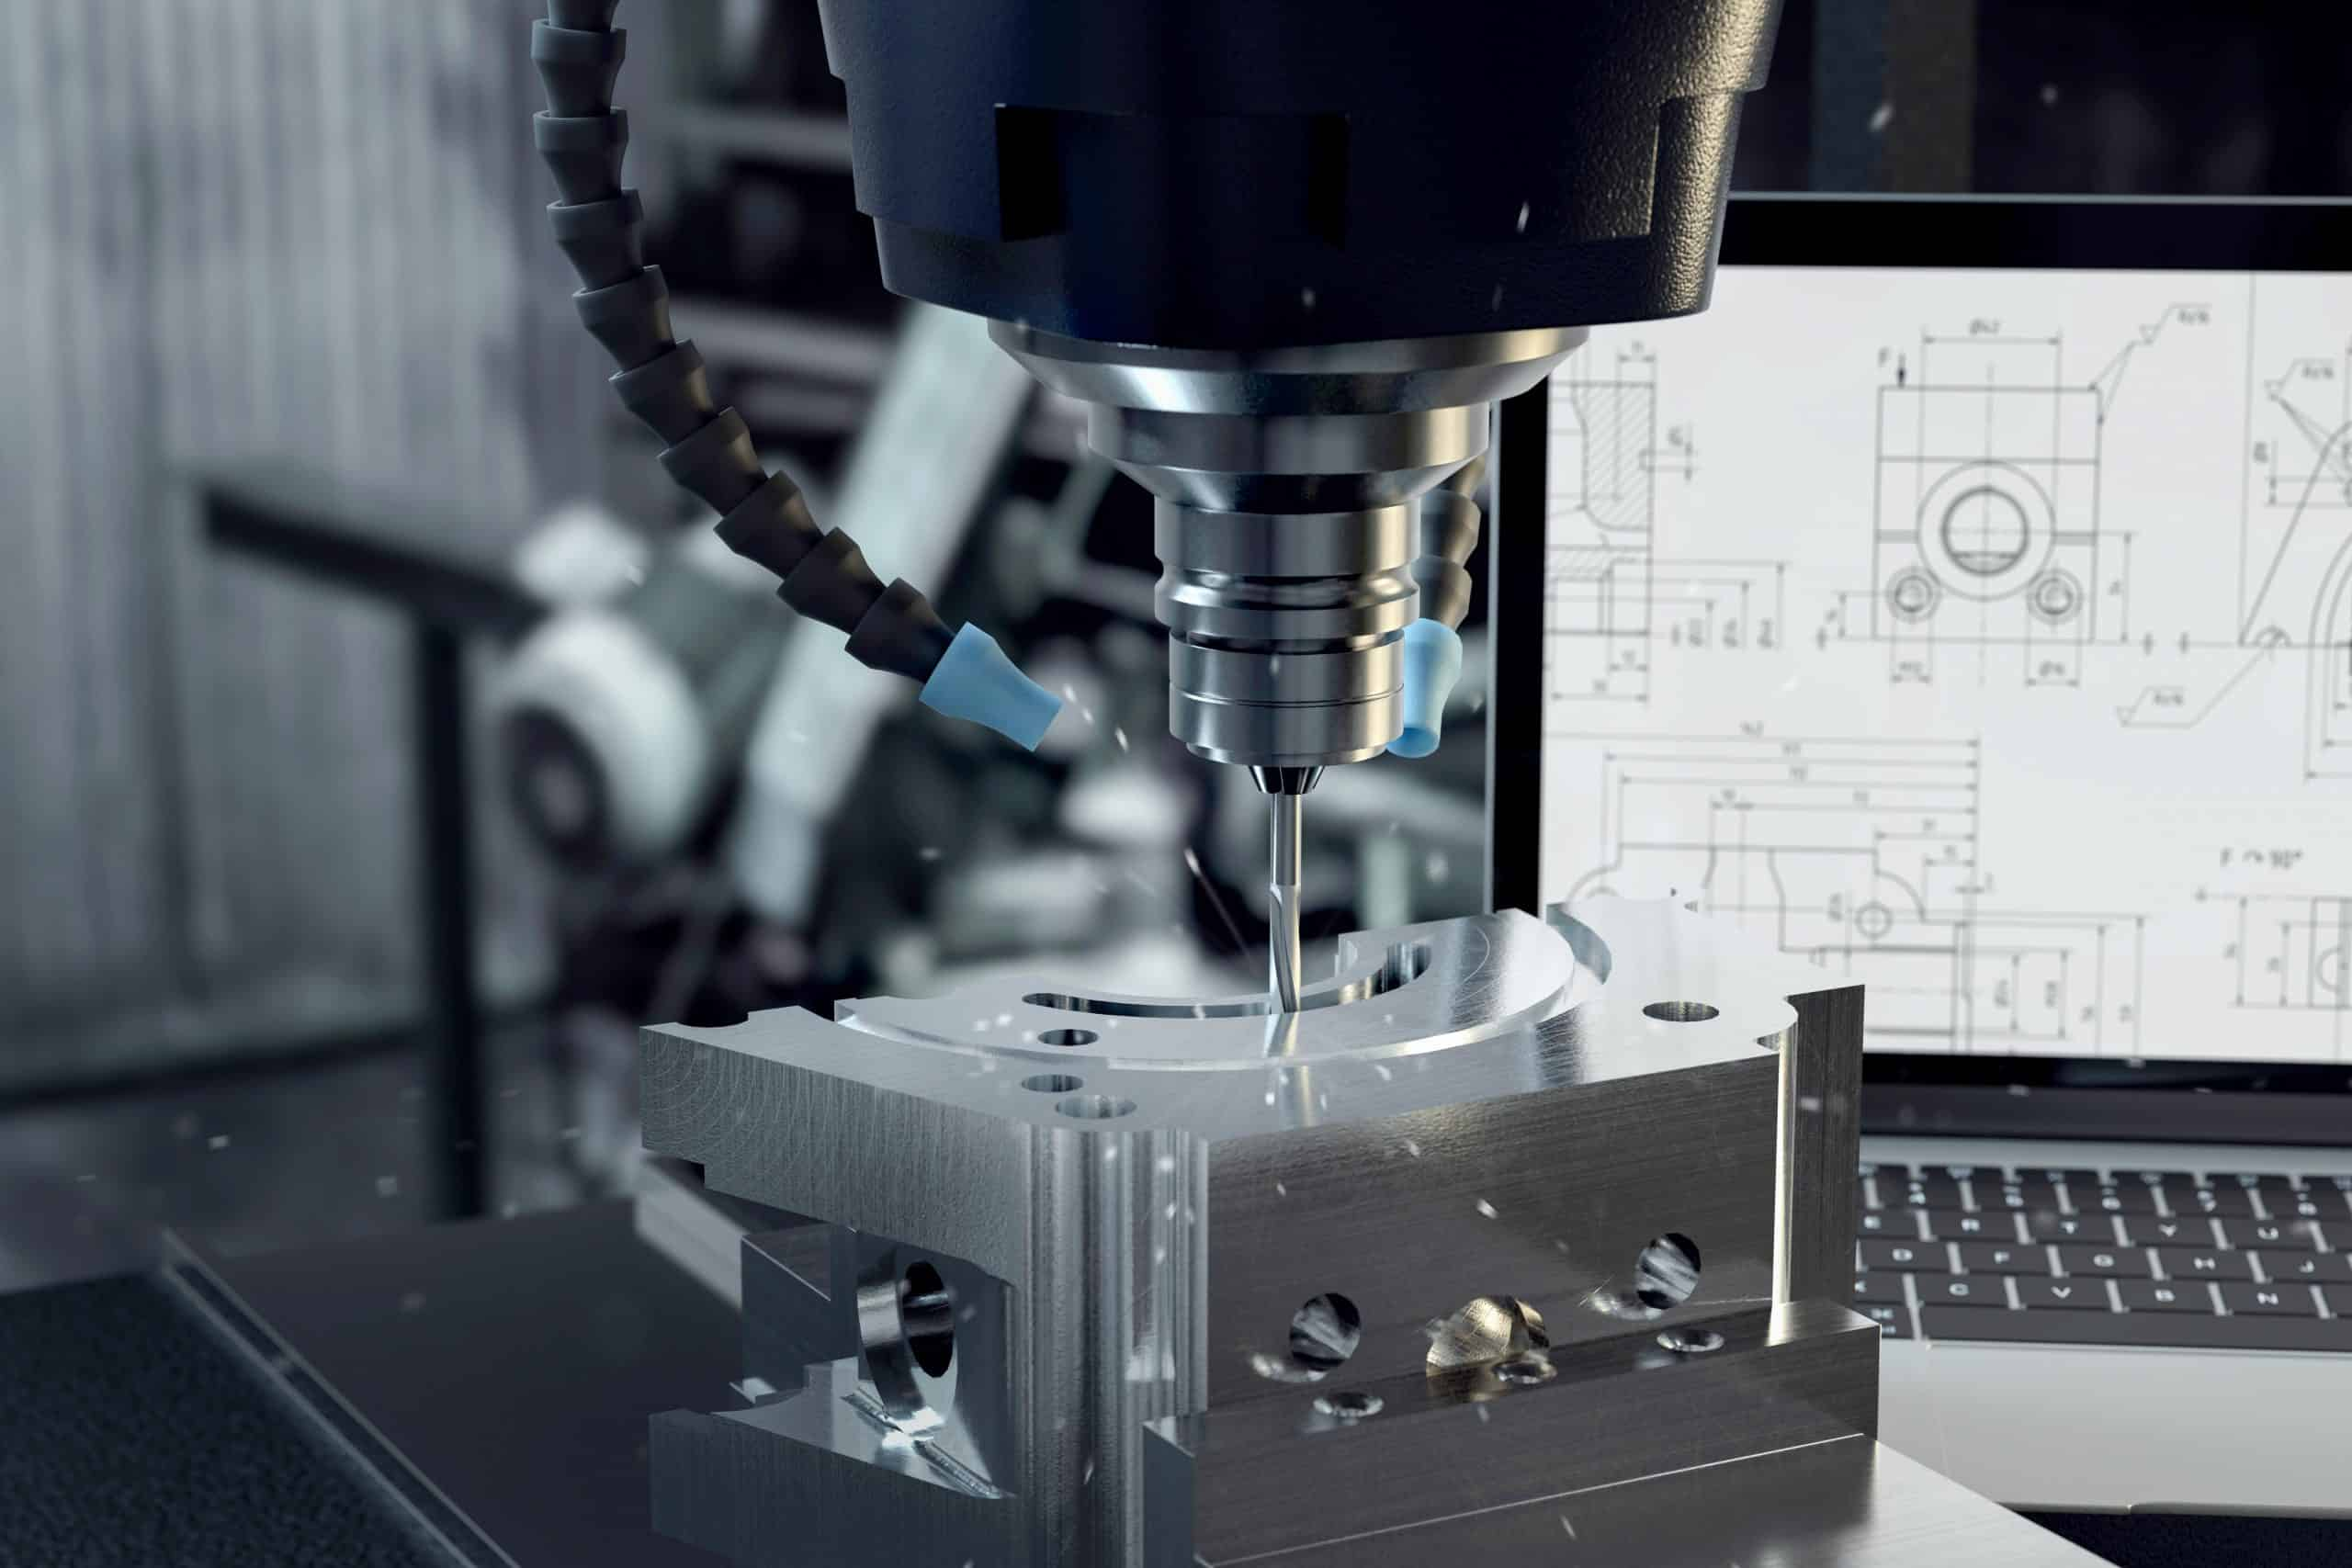 CNC milling metalworking